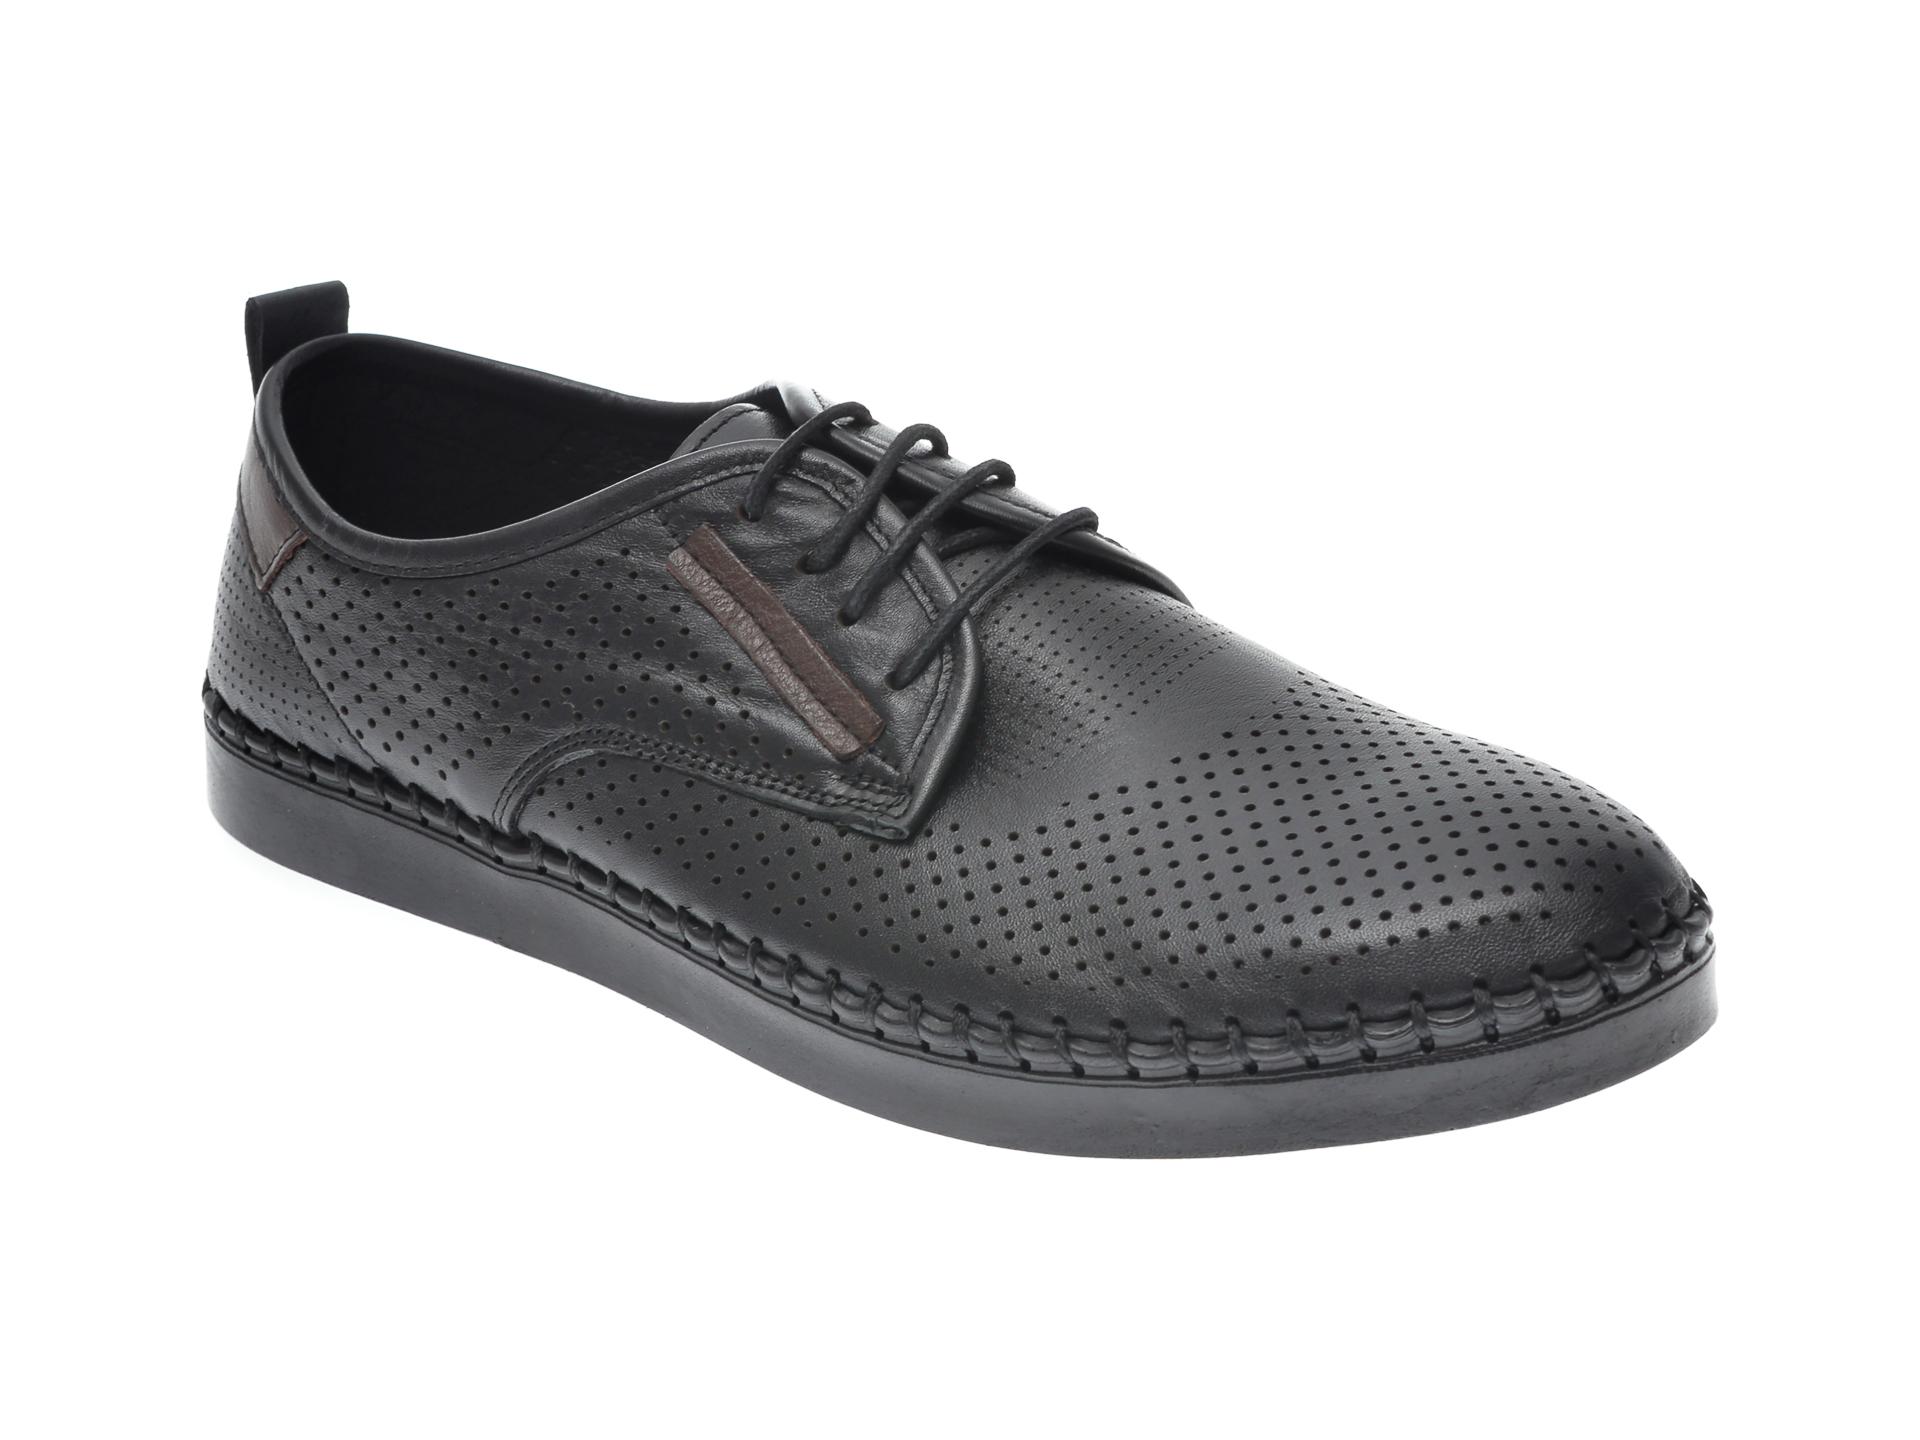 Pantofi OTTER negri, 2871, din piele naturala imagine